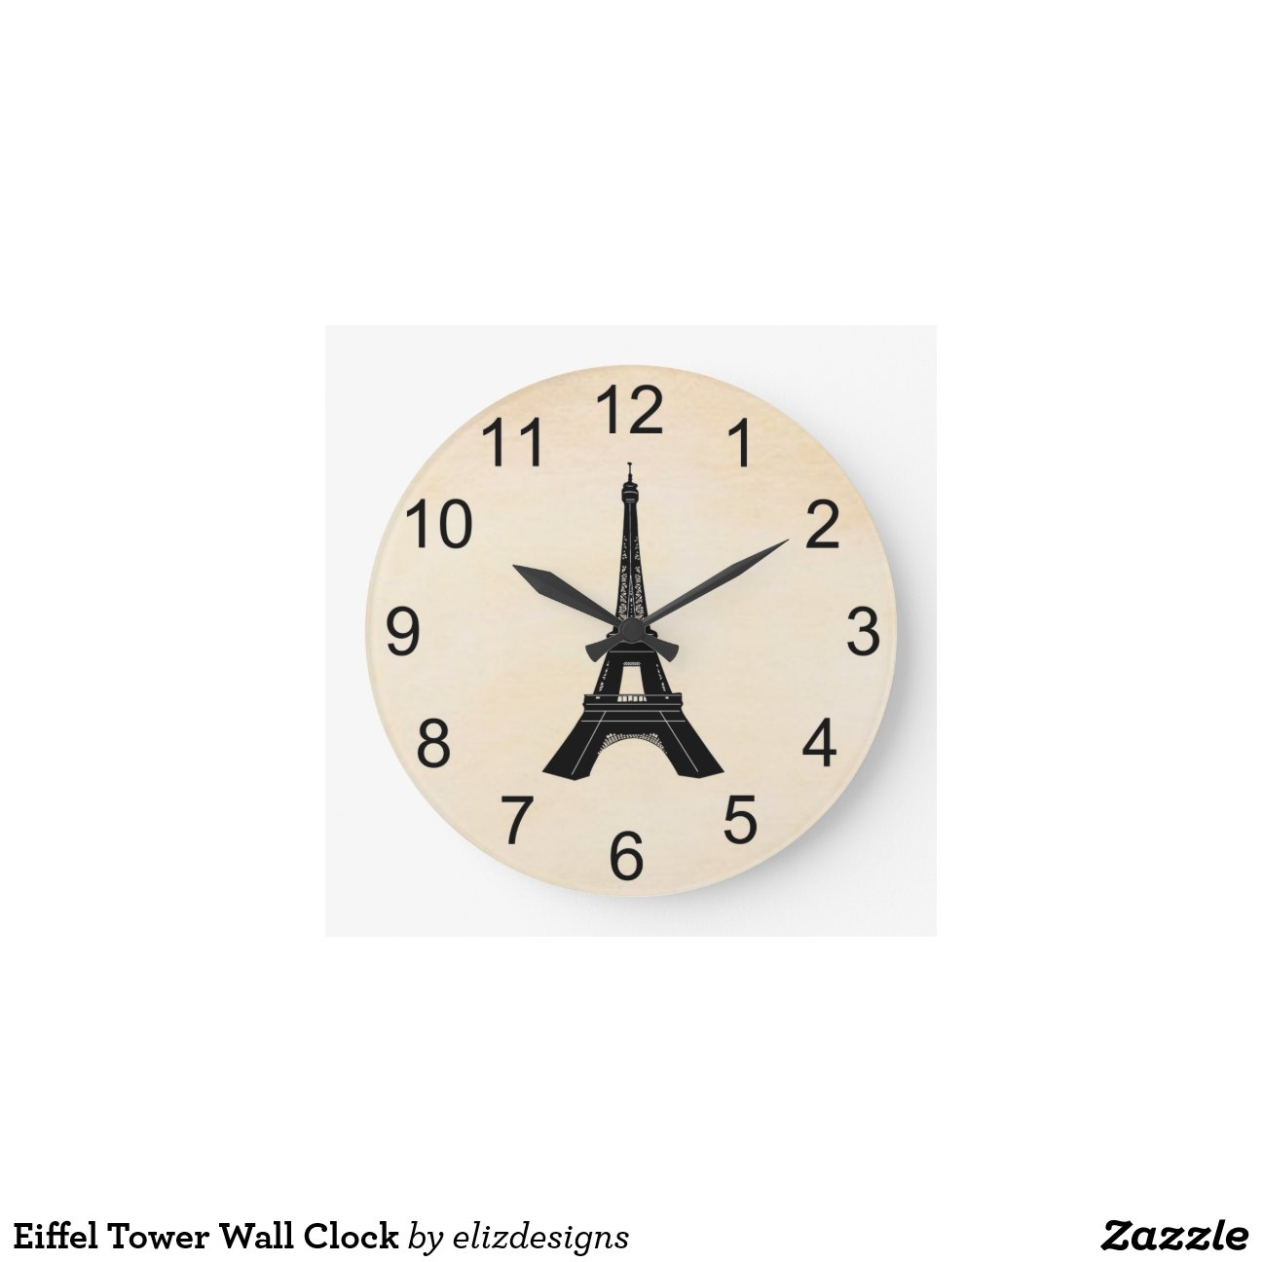 Reloj de pared de la torre eiffel zazzle - Relojes de pared diseno ...